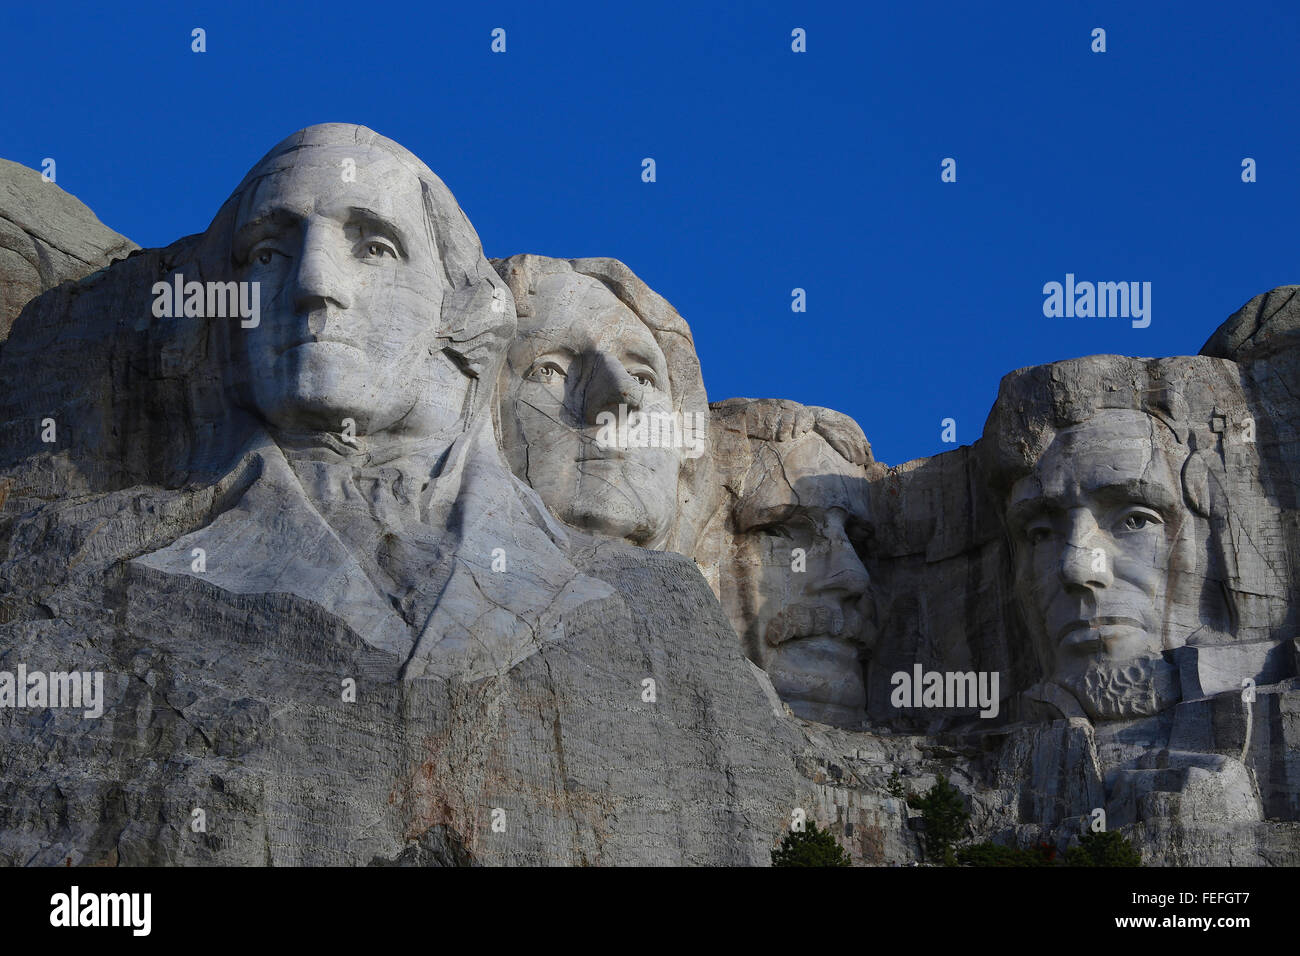 Mount Rushmore National Memorial cielo blu chiaro Immagini Stock